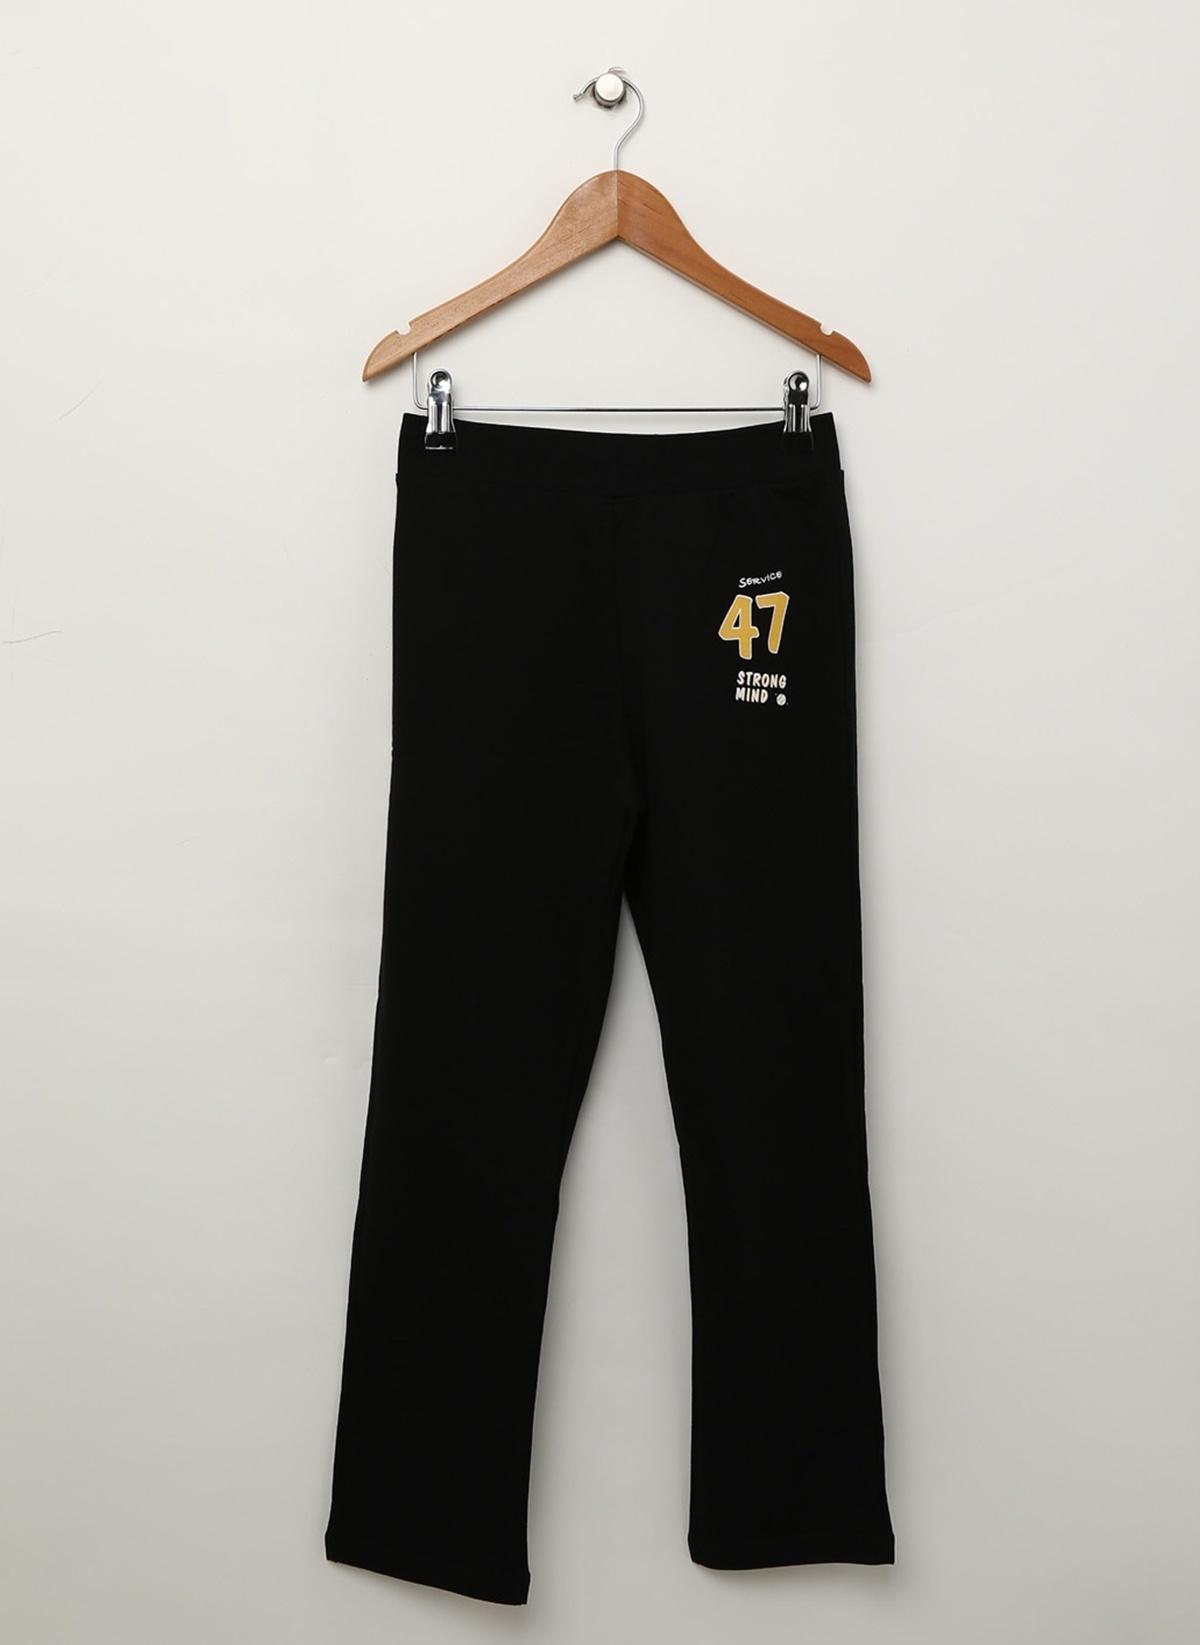 Limon Company Eşofman Altı 19-basıcboylimon Sweatpant – 39.95 TL